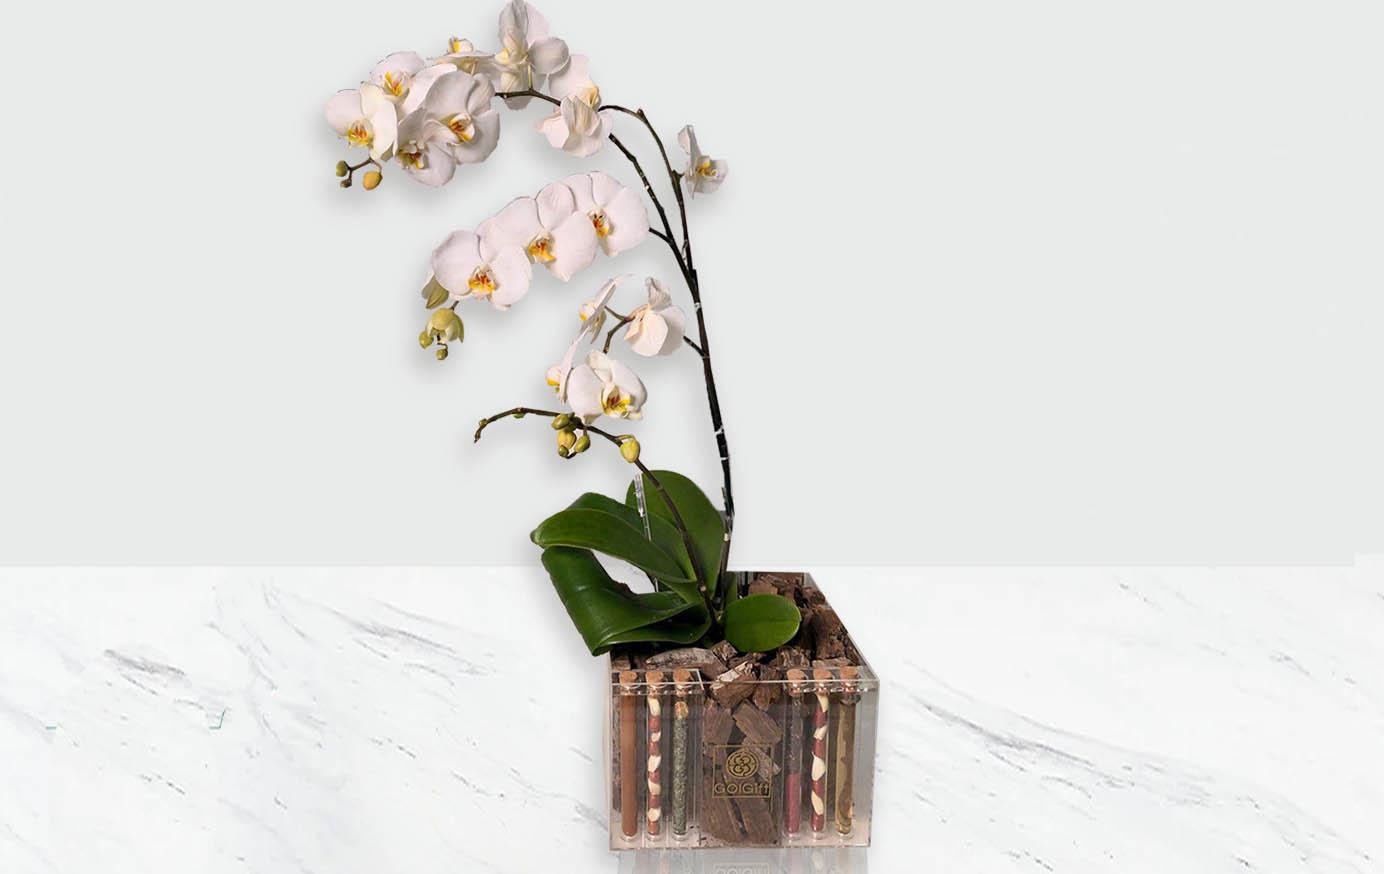 سفارش گل نوروزی